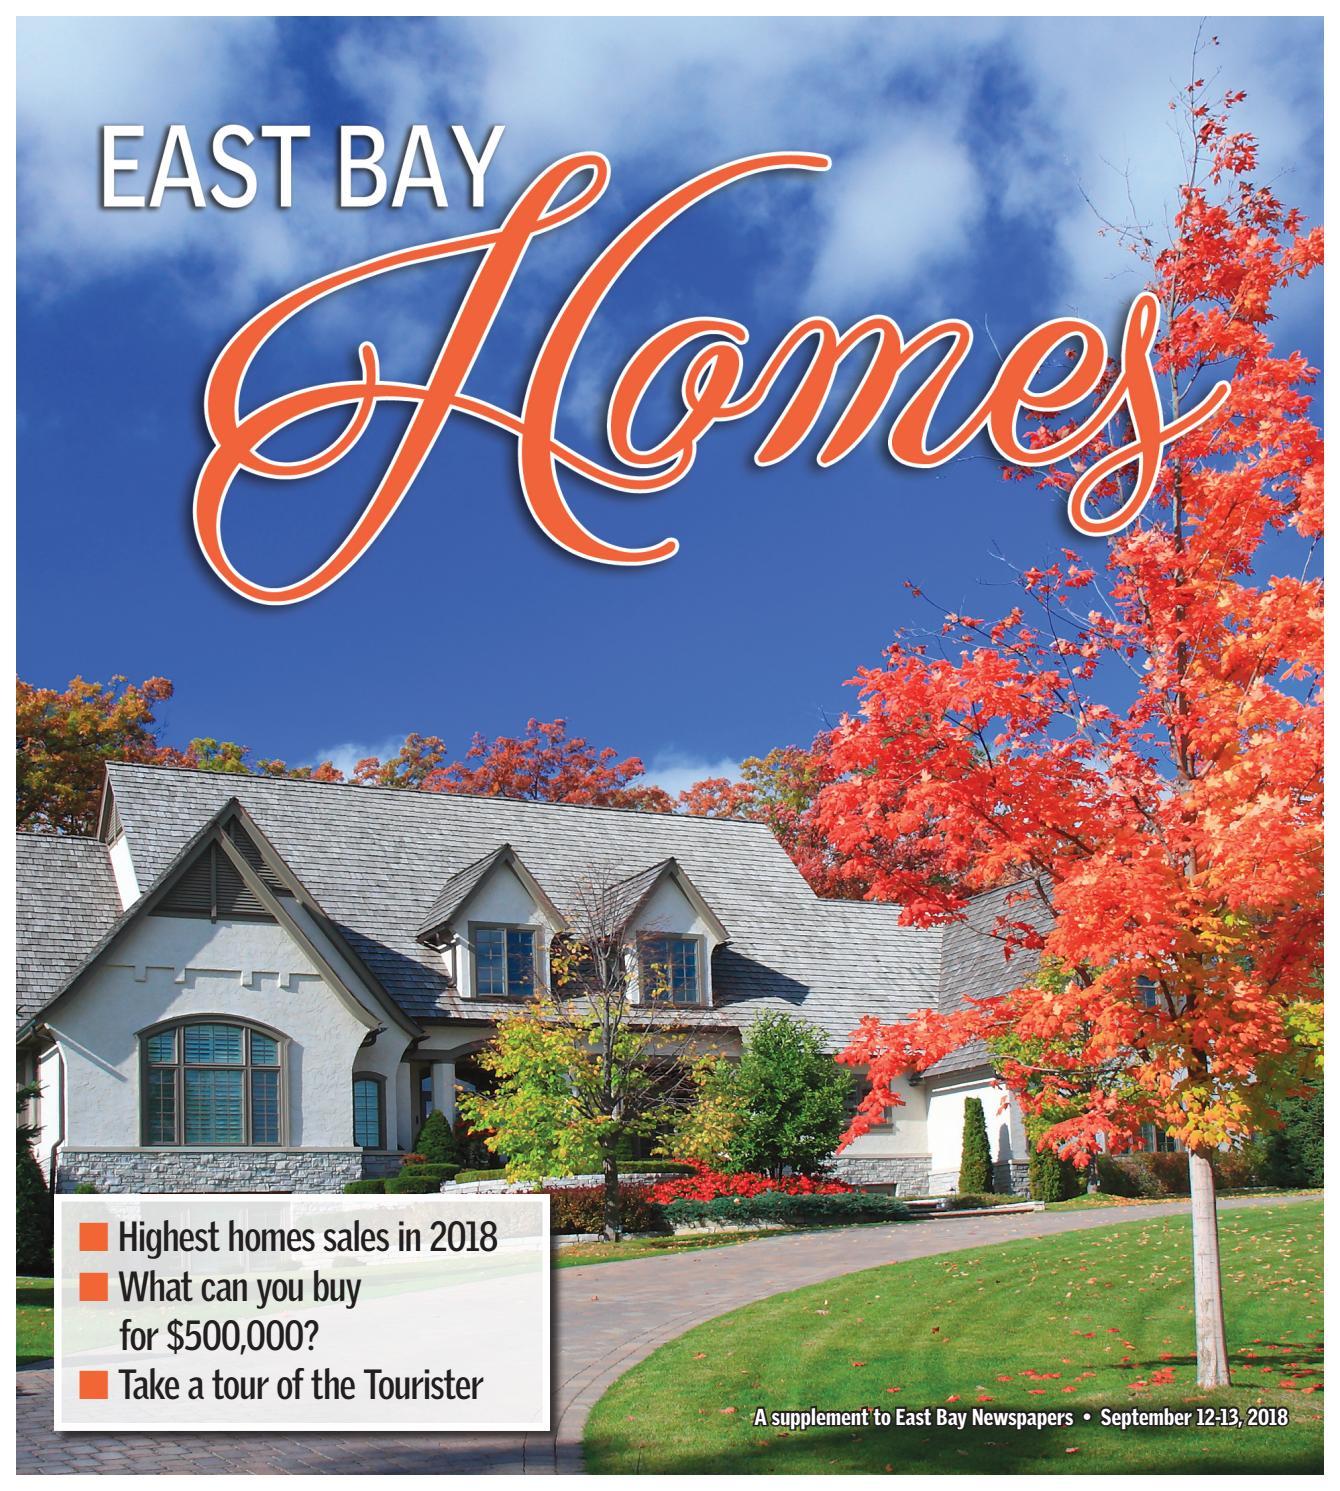 East Bay Homes - Fall 2018 by East Bay Newspapers - issuu